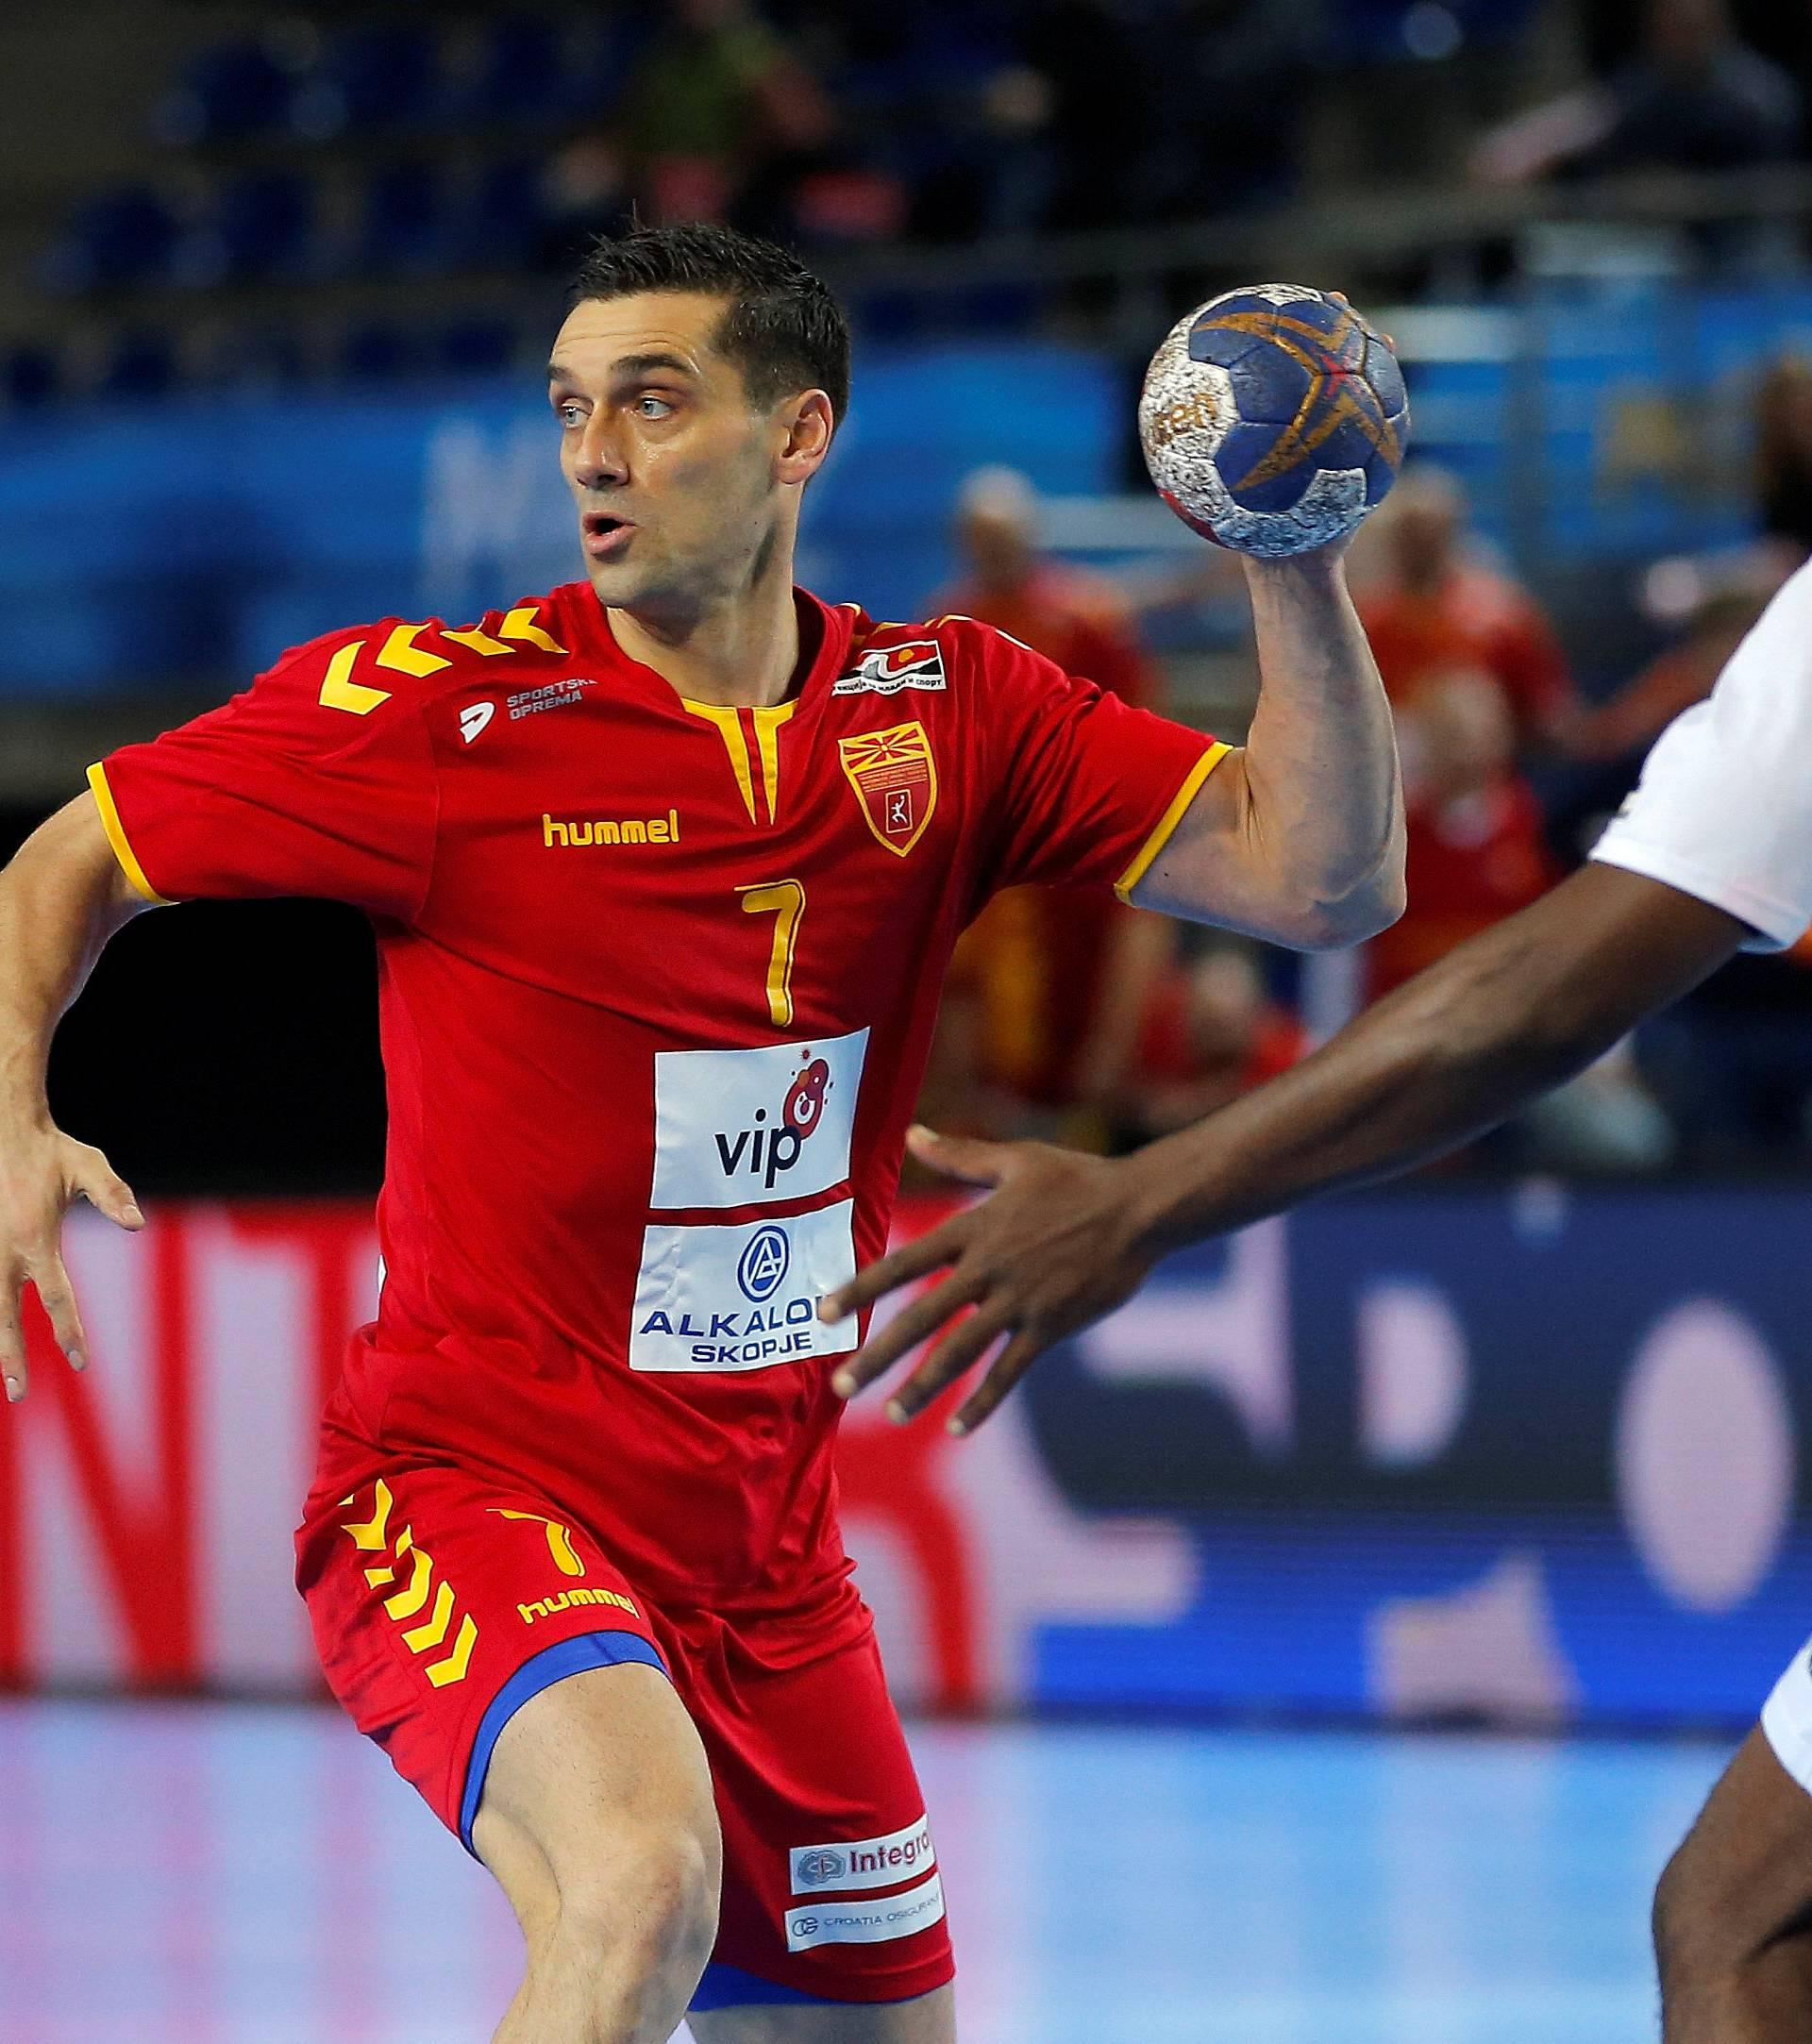 Men's Handball - Macedonia v Tunisia - 2017 Men's World Championship Main Round - Group B